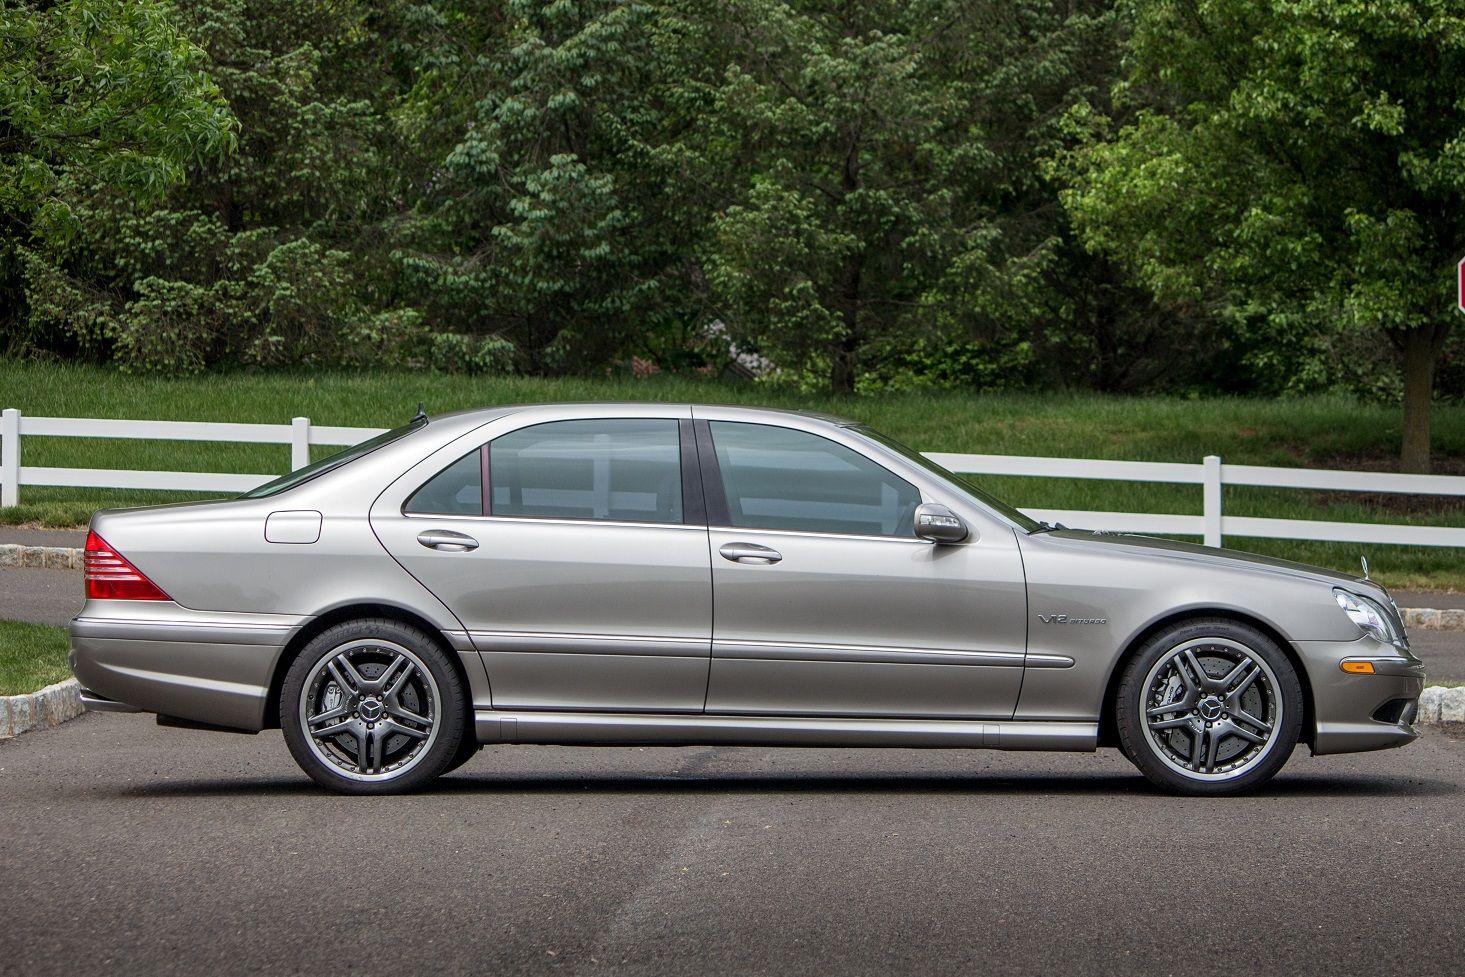 5KMile 2006 MercedesBenz S65 AMG Mercedes benz, Benz